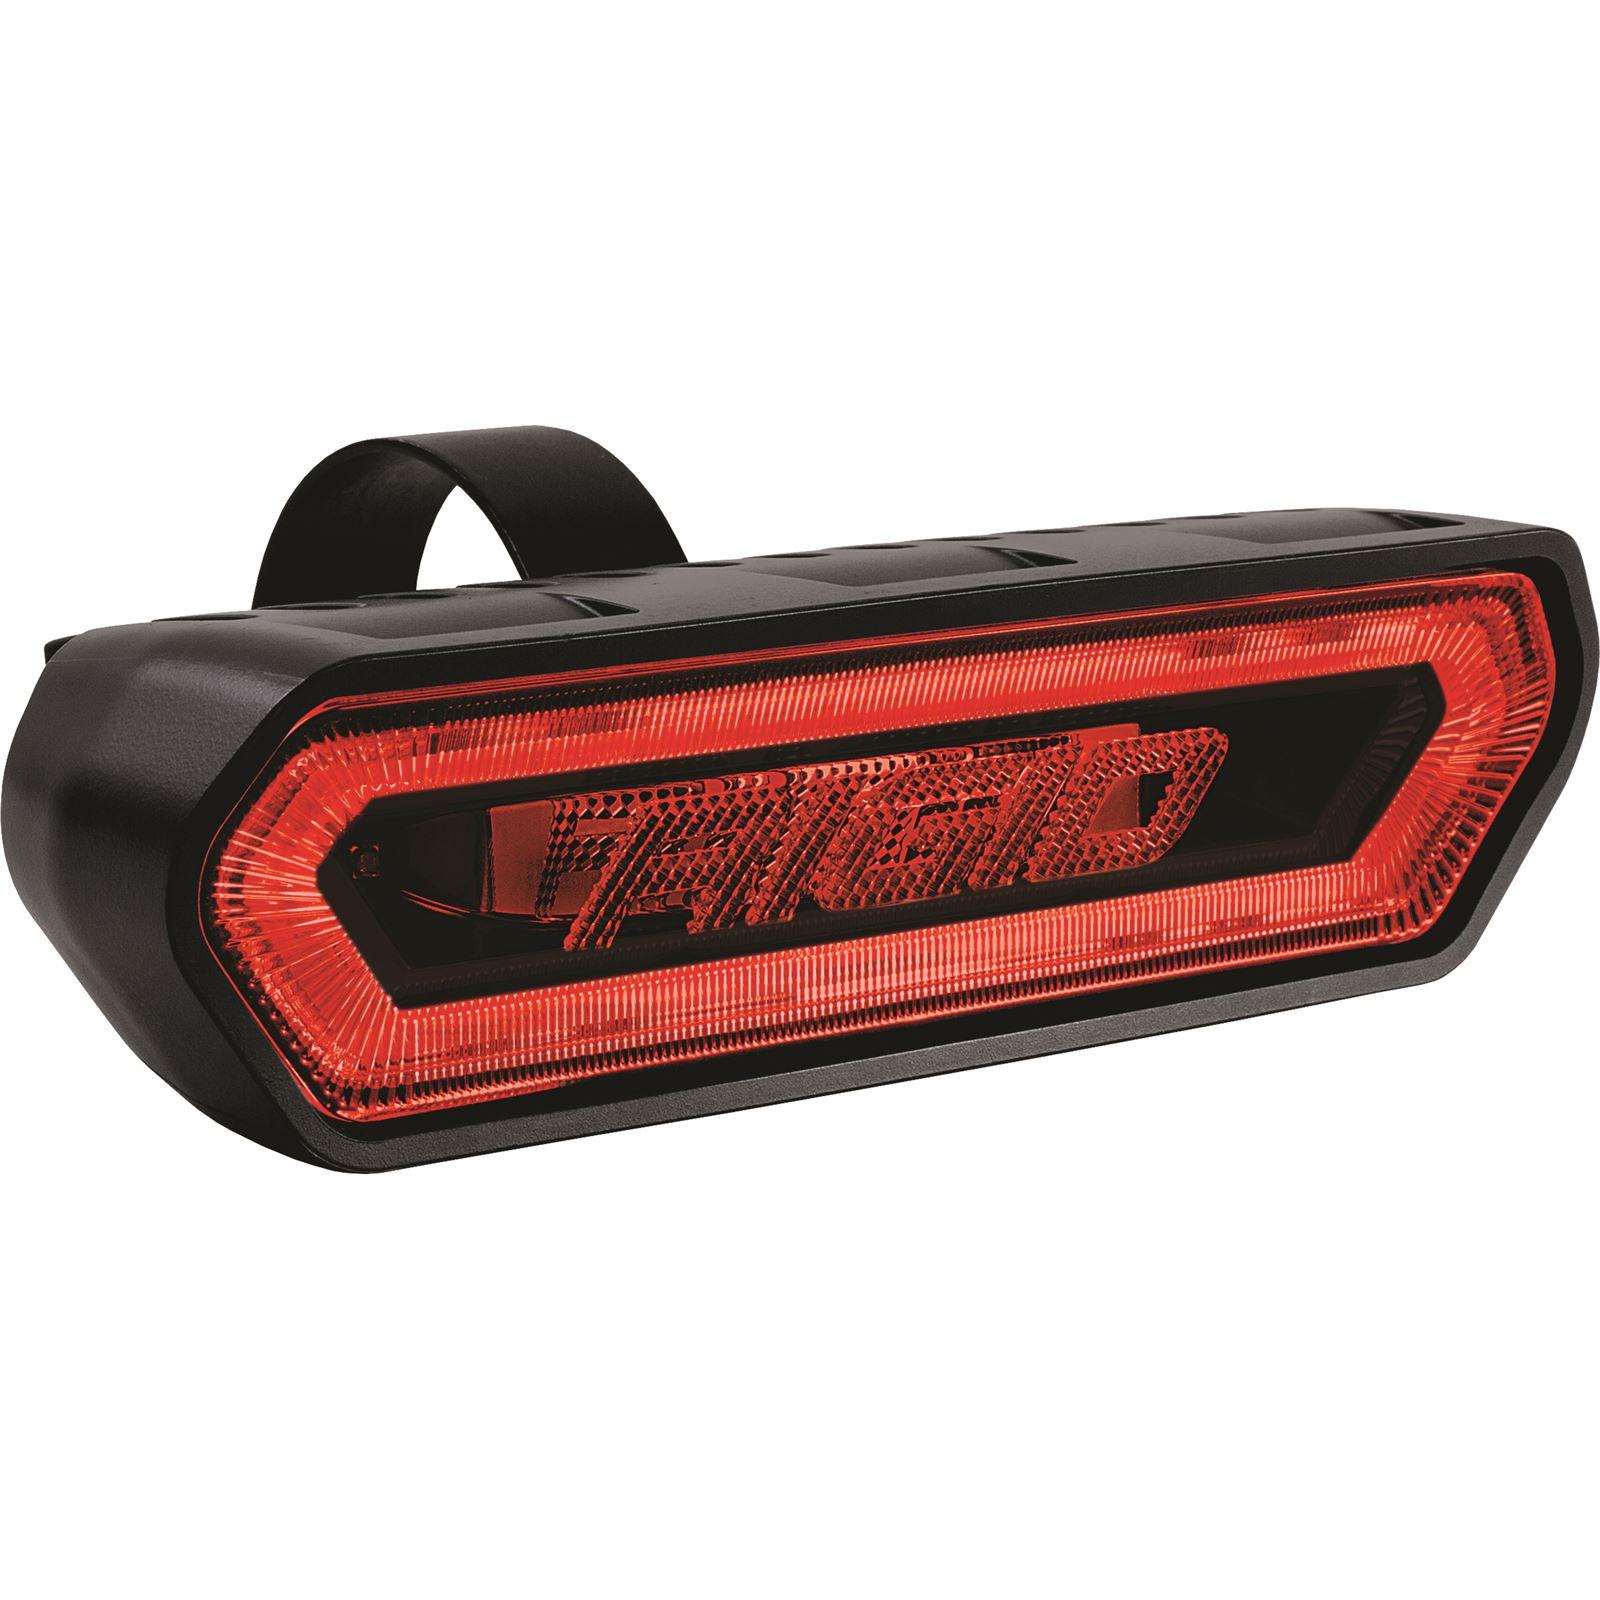 Rigid Chase Series LED Light